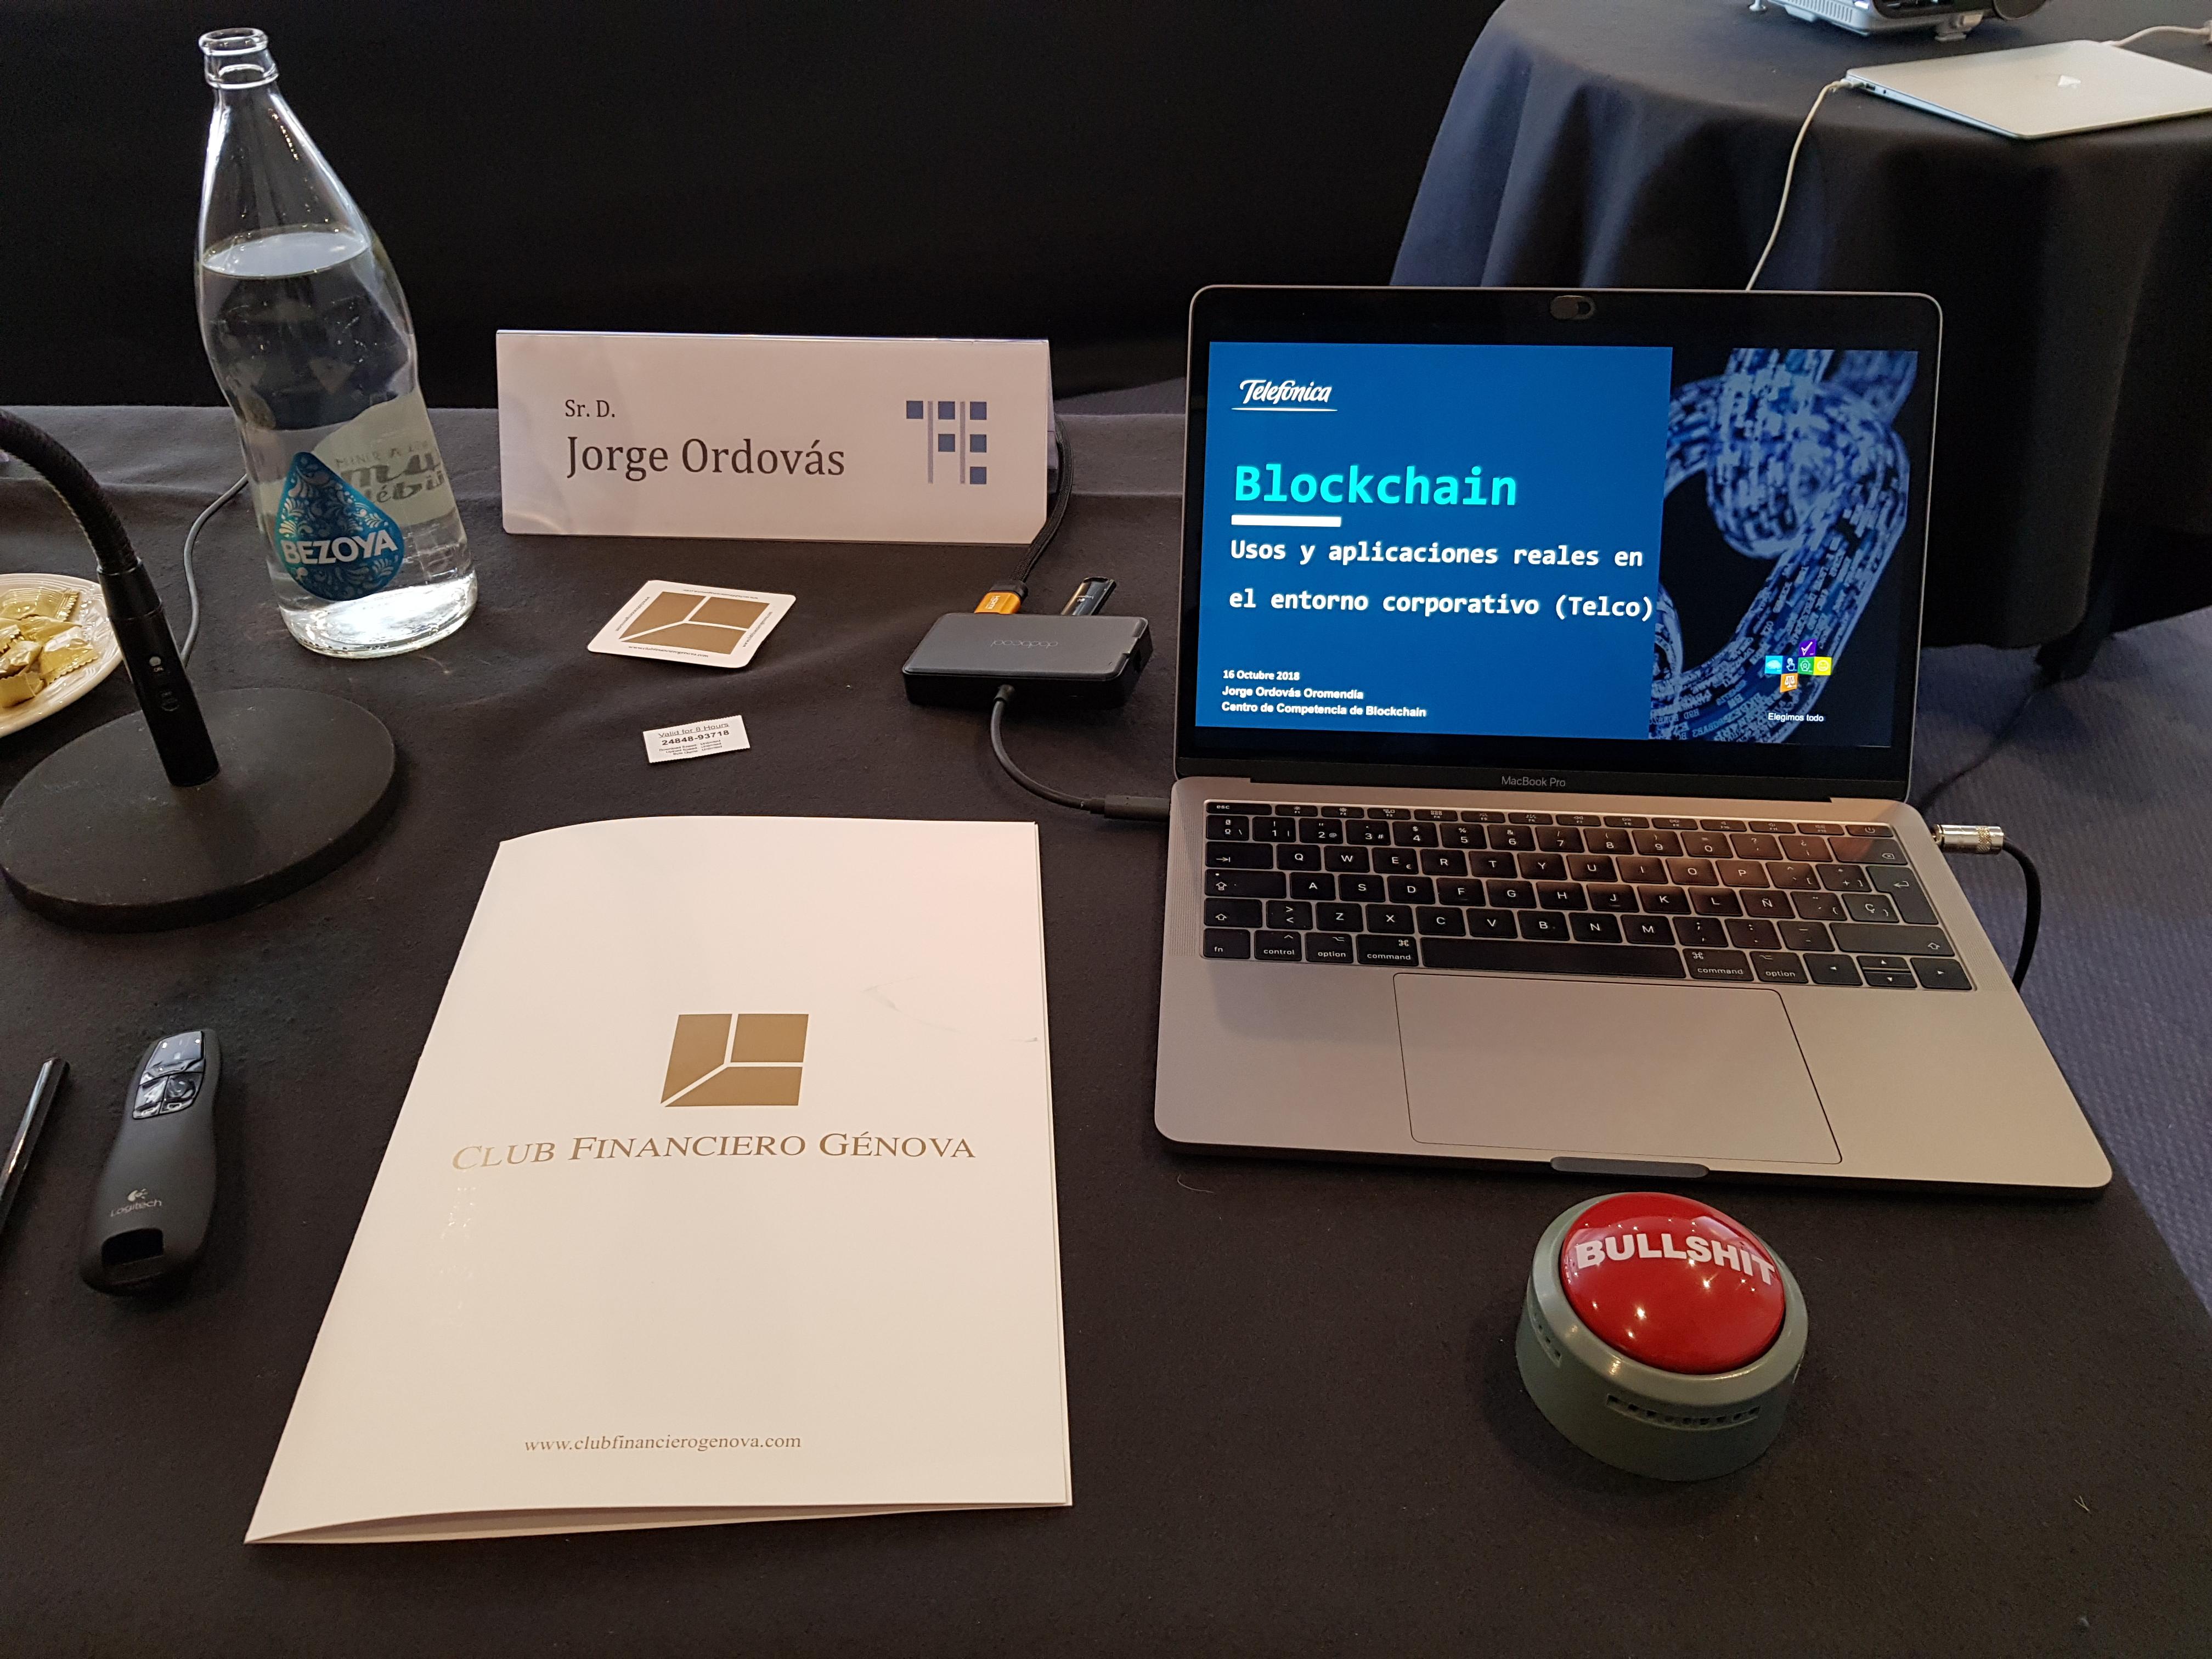 Blockchain-usos-corporativos